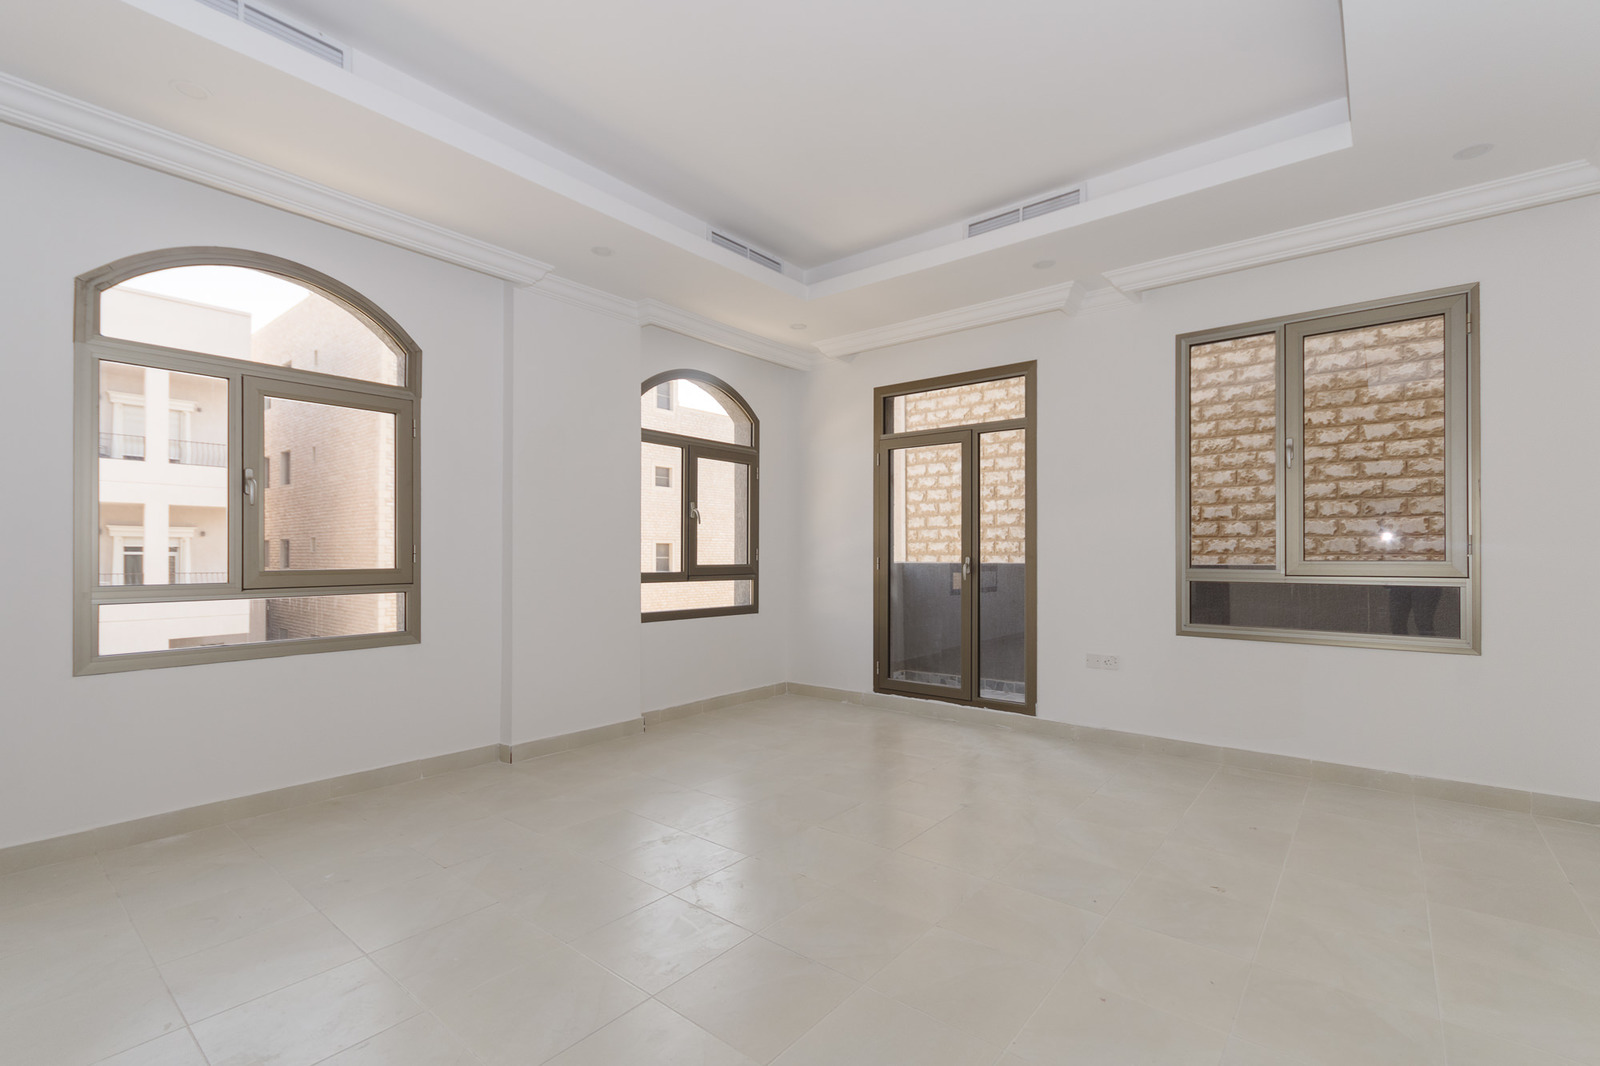 Salwa – new, unfurnished three bedroom apartment w/balcony